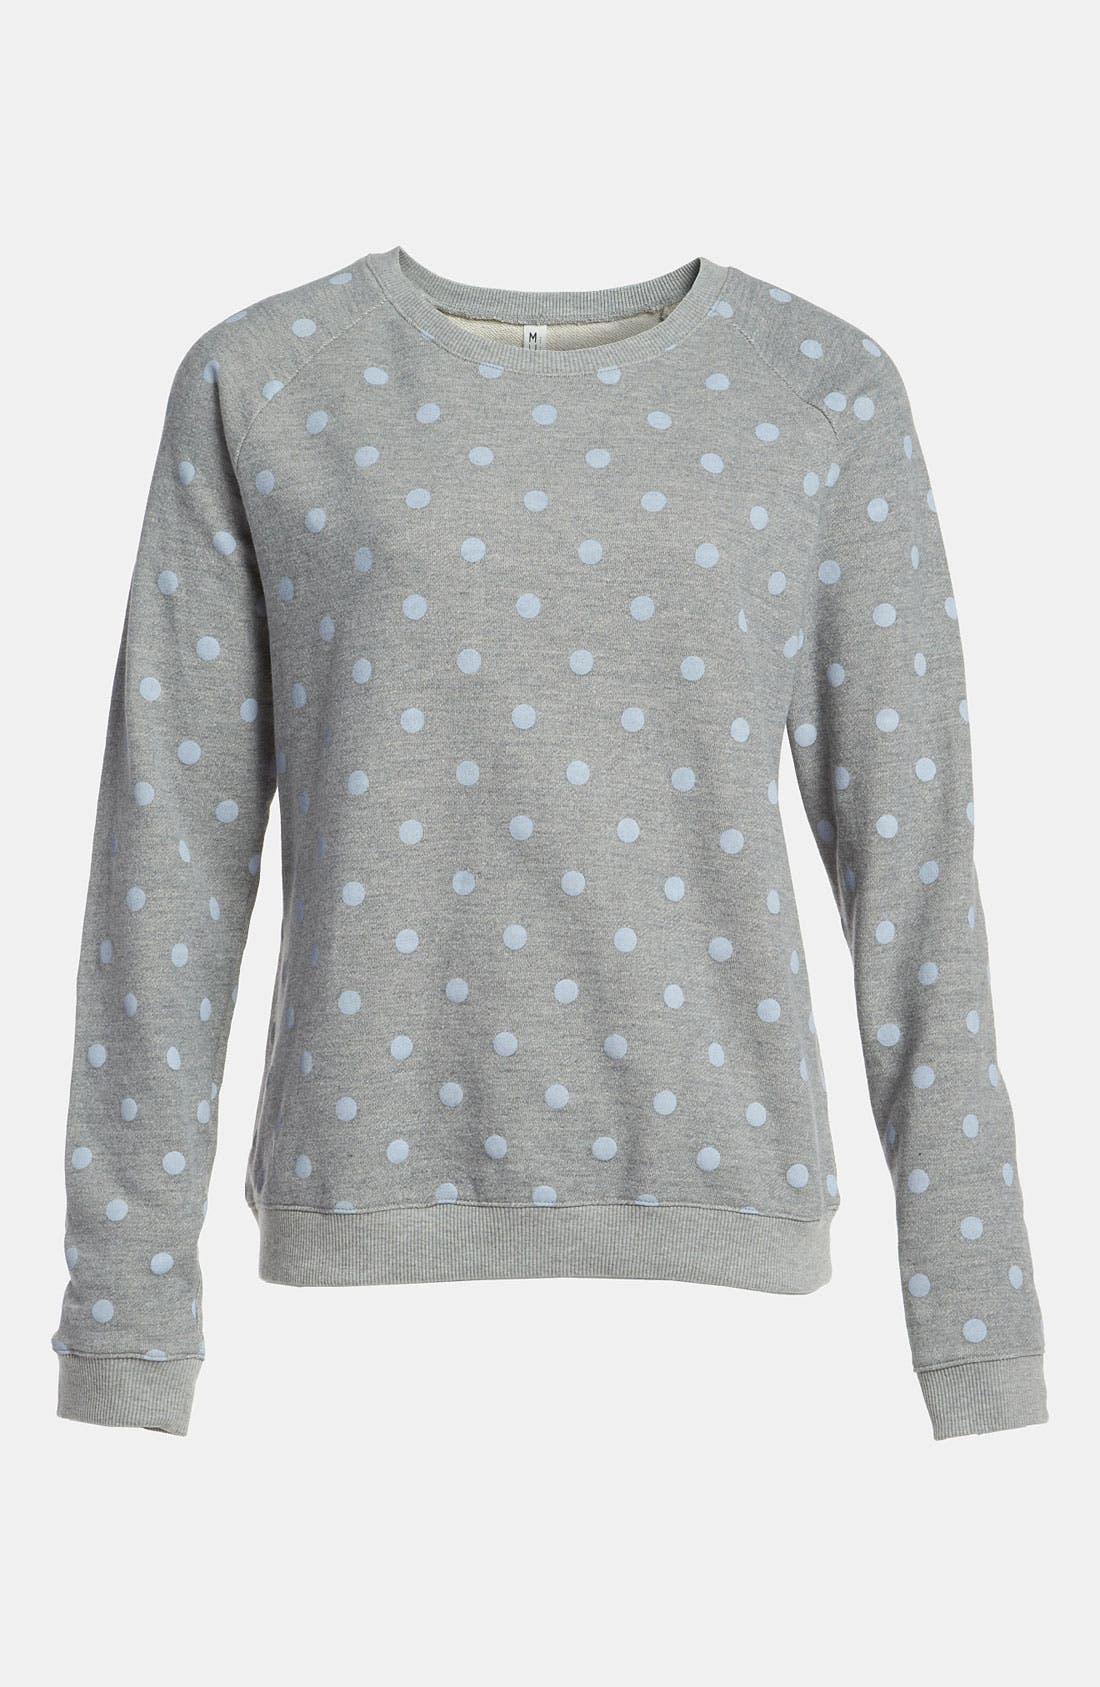 Main Image - Mural Polka Dot Sweatshirt